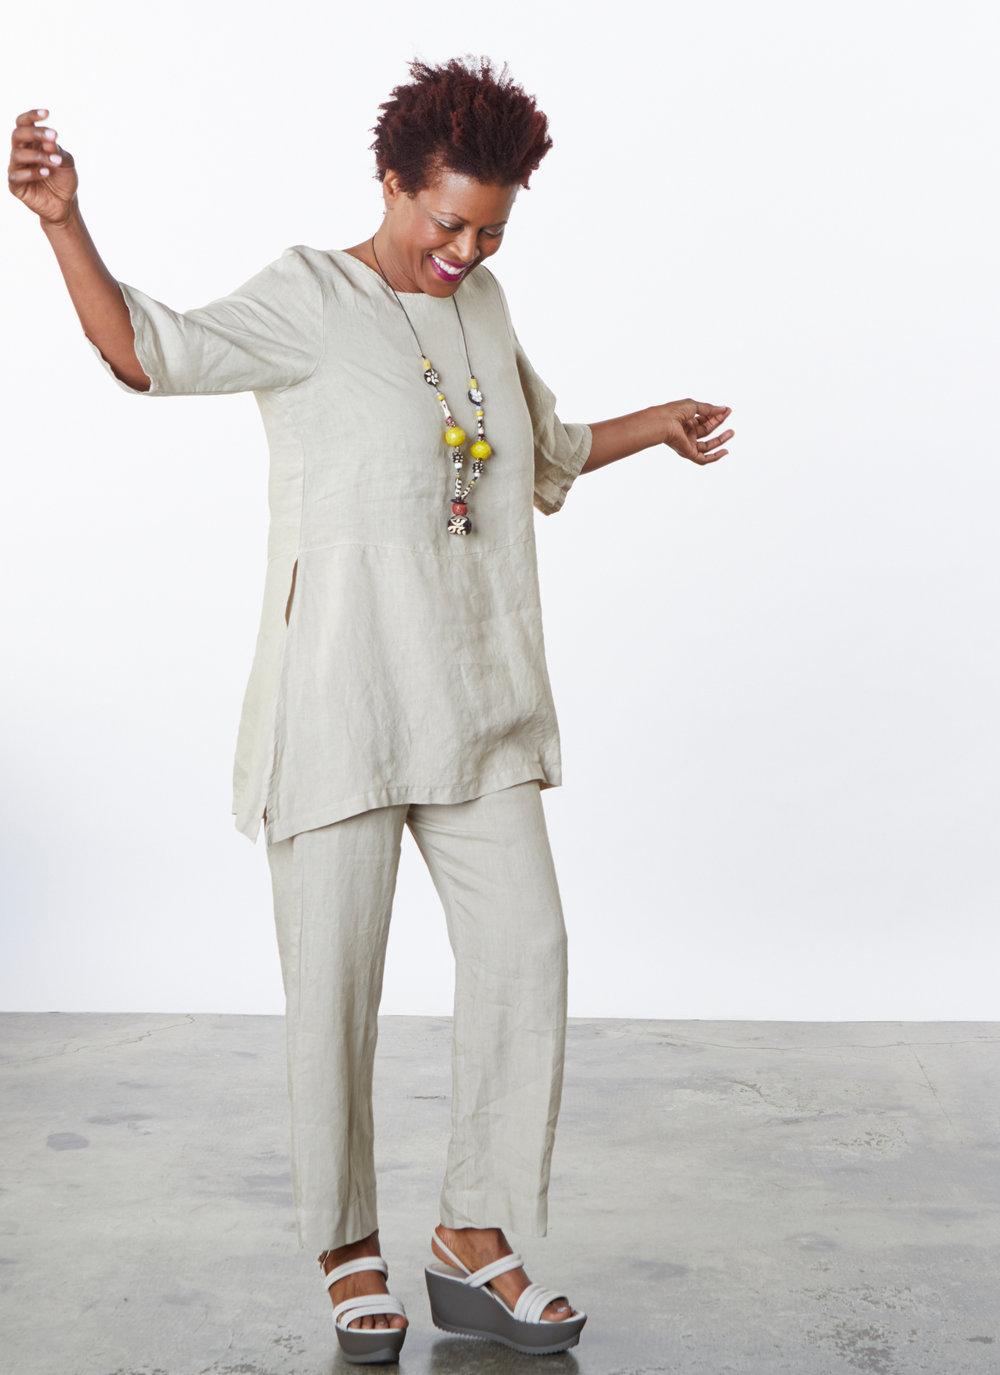 Bre Tunic, Flat Front Pant in Lark Light Linen